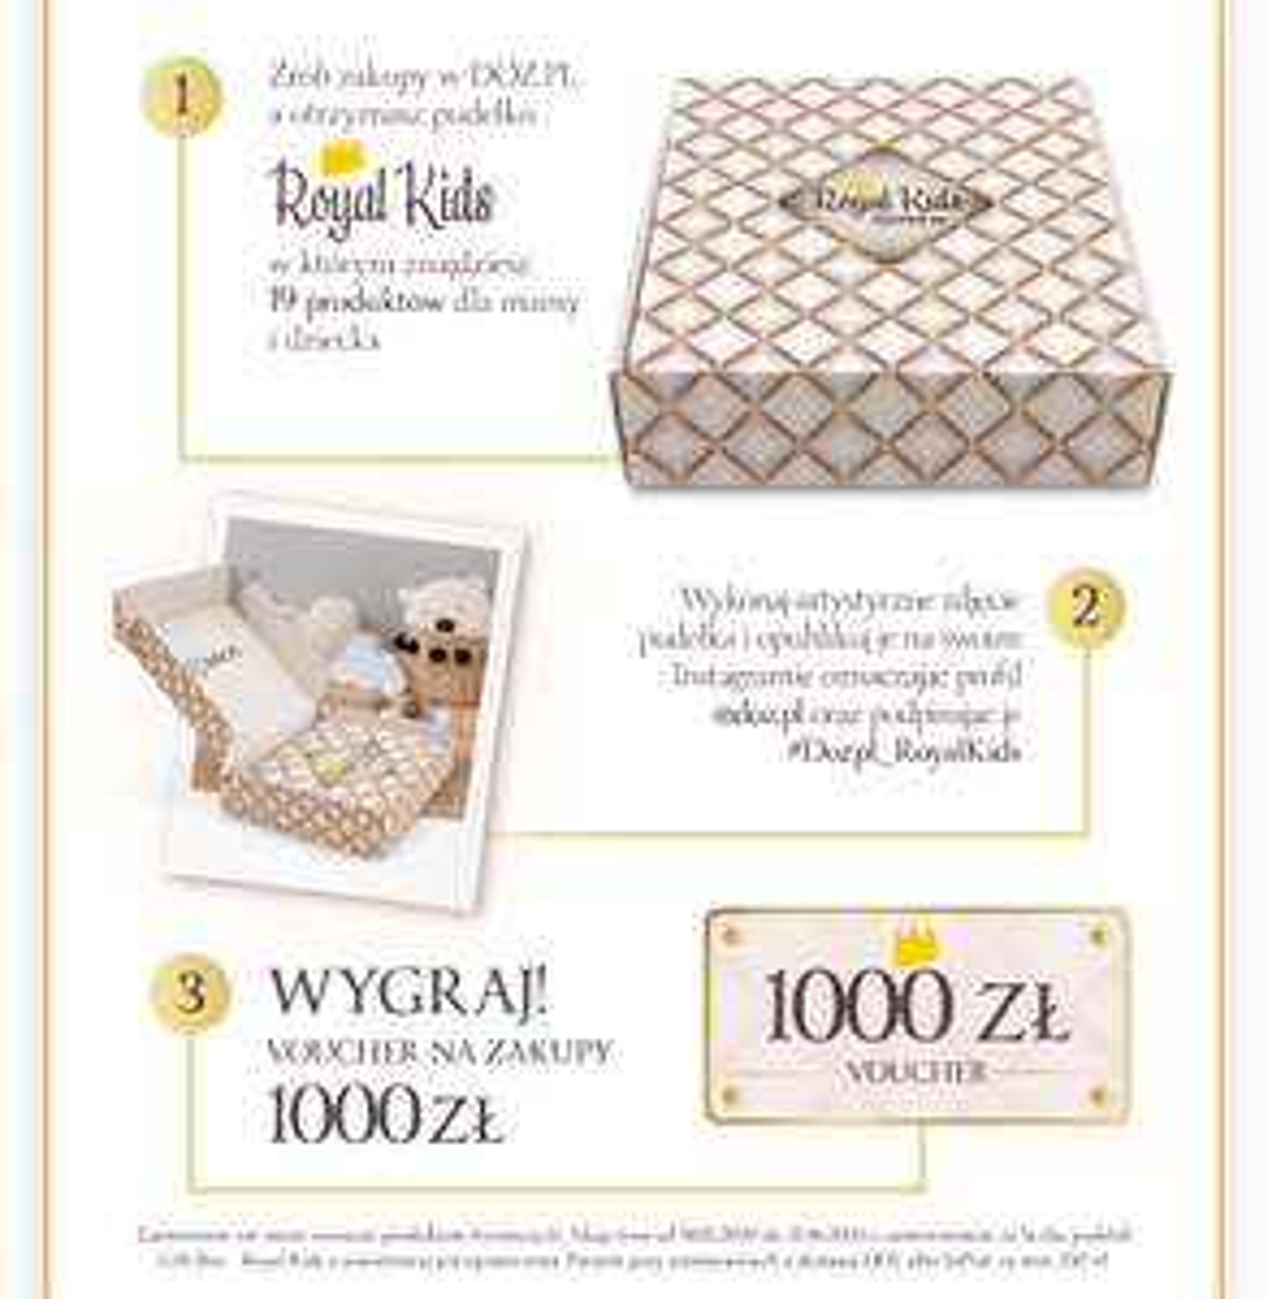 DOZ GIFT BOX mwz 250